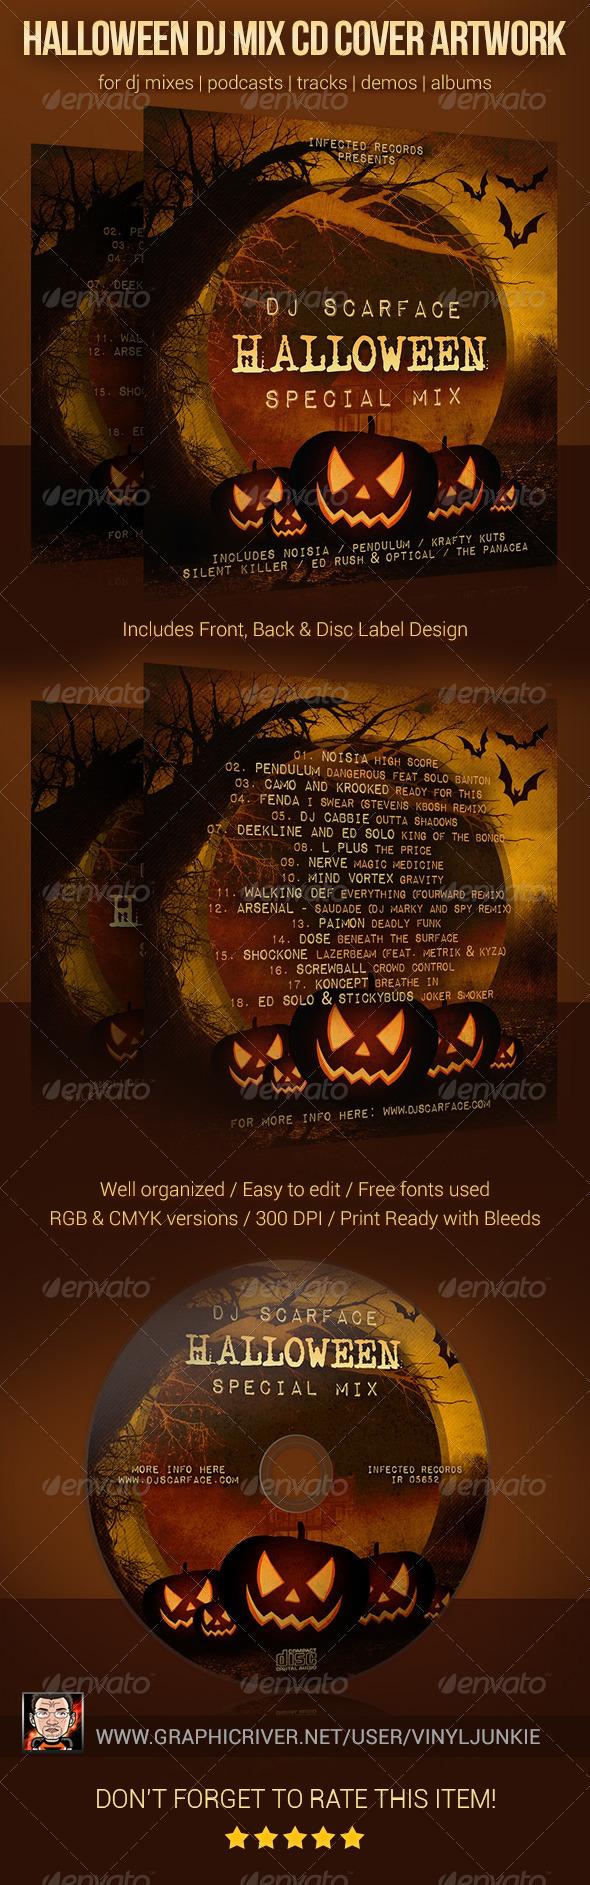 GraphicRiver Halloween DJ Mix CD Cover Artwork Template 5872020